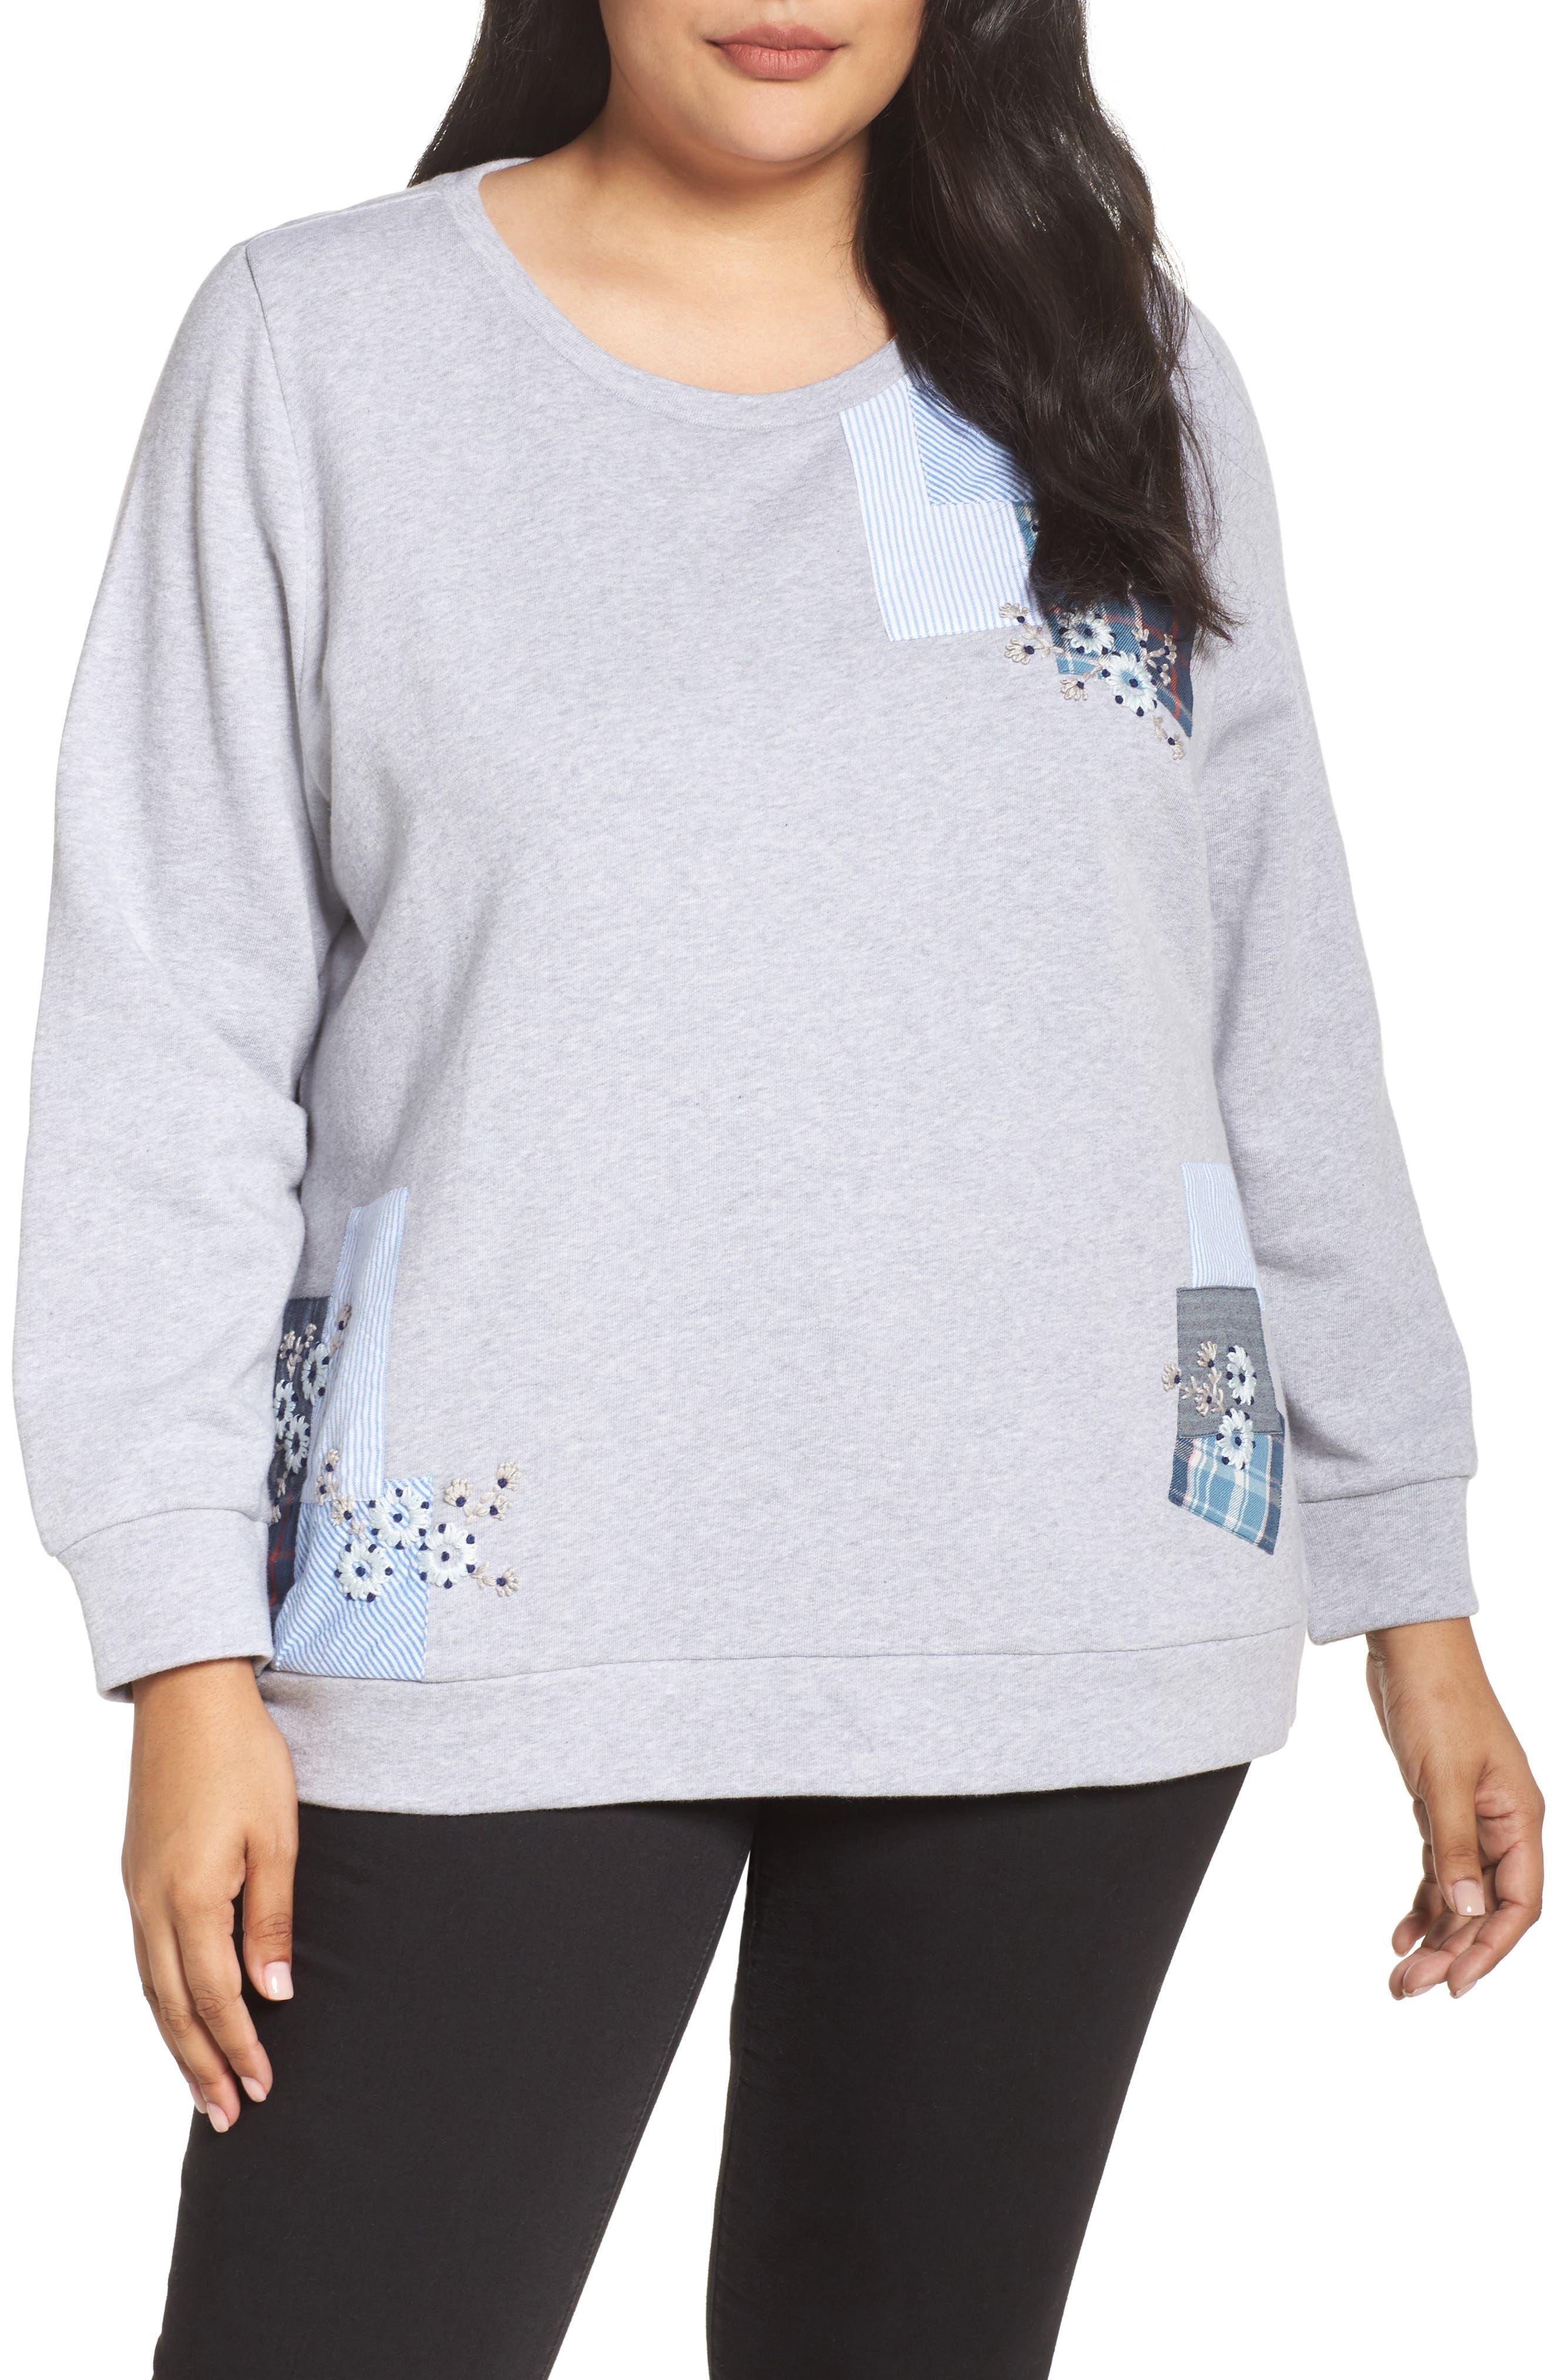 Patchwork Sweatshirt,                             Main thumbnail 1, color,                             Grey Floral